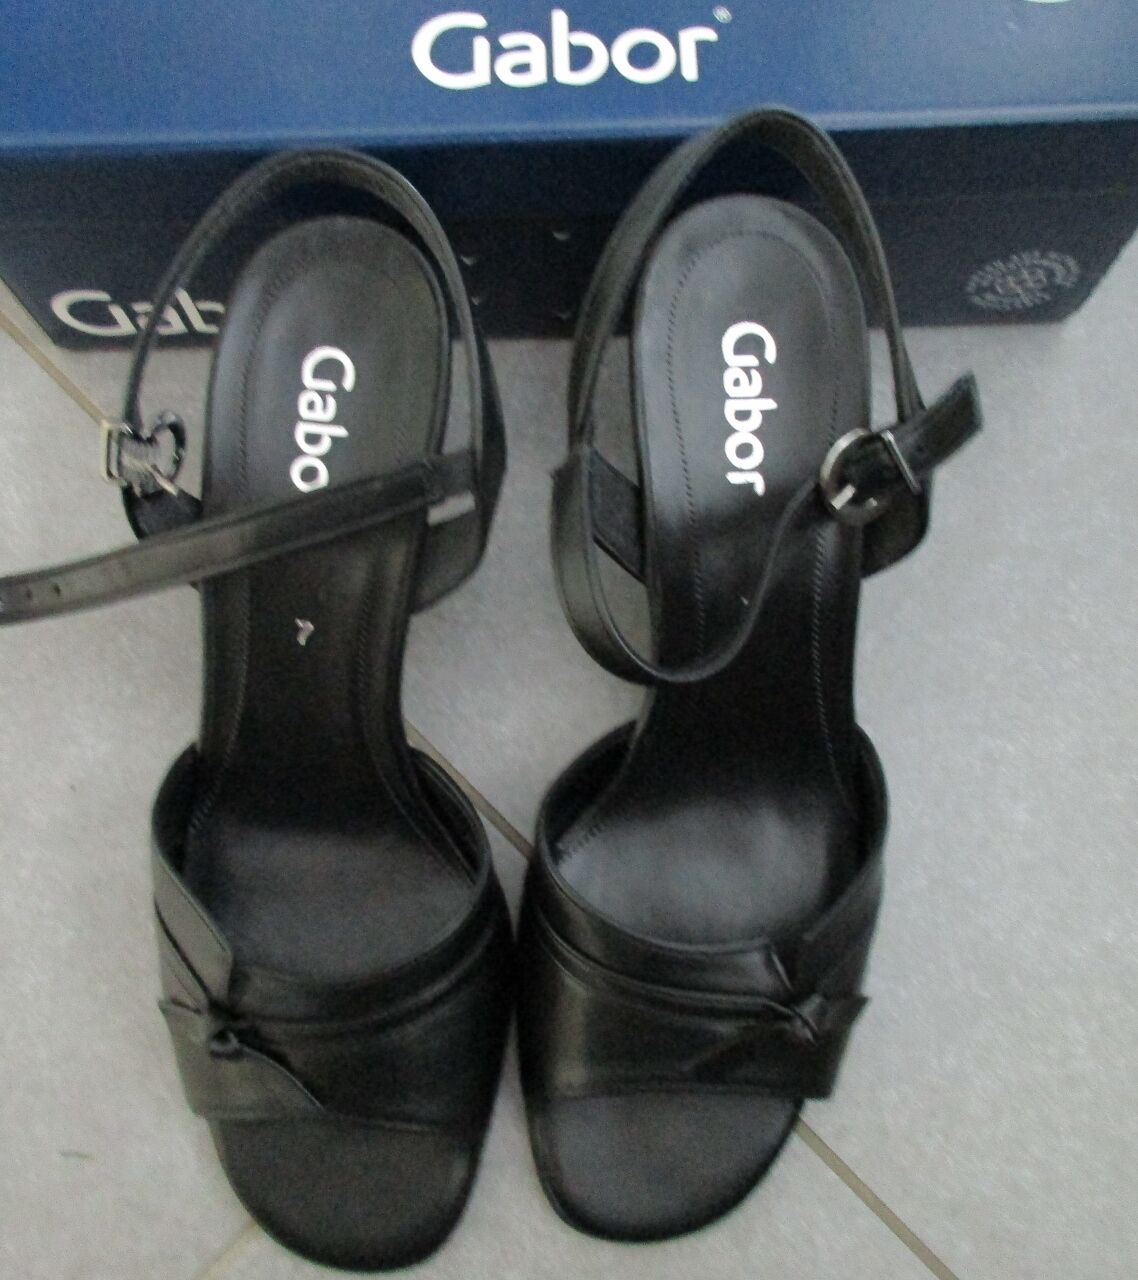 Gabor Schuhe Schuhe Gabor Sandalen Sandaletten Pumps Riemchenpumps Nappa schwarz Gr. 7 41 41f968